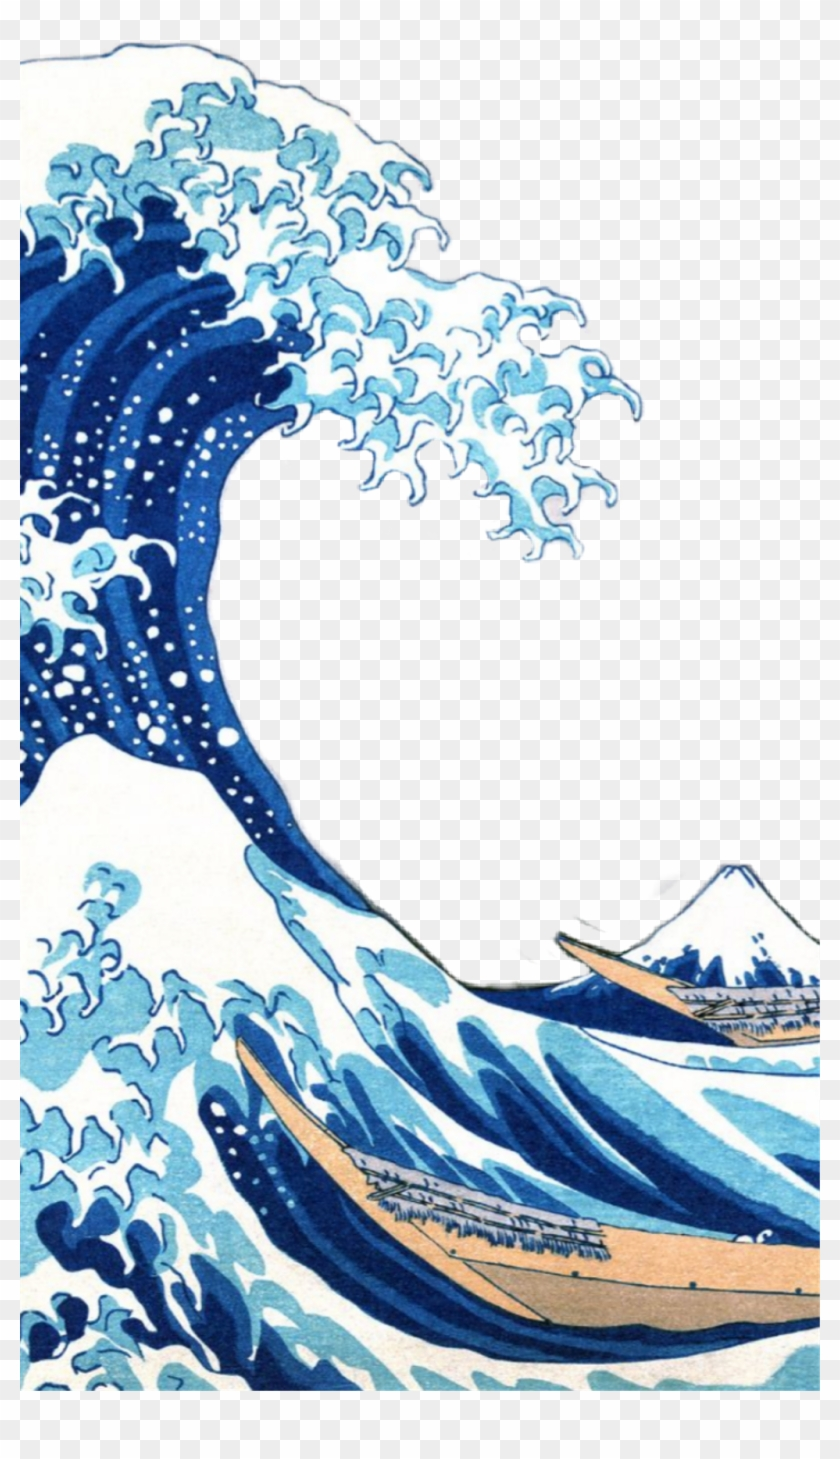 Thegreatwave Aesthetic Wave Ocean Water Great Wave Iphone X